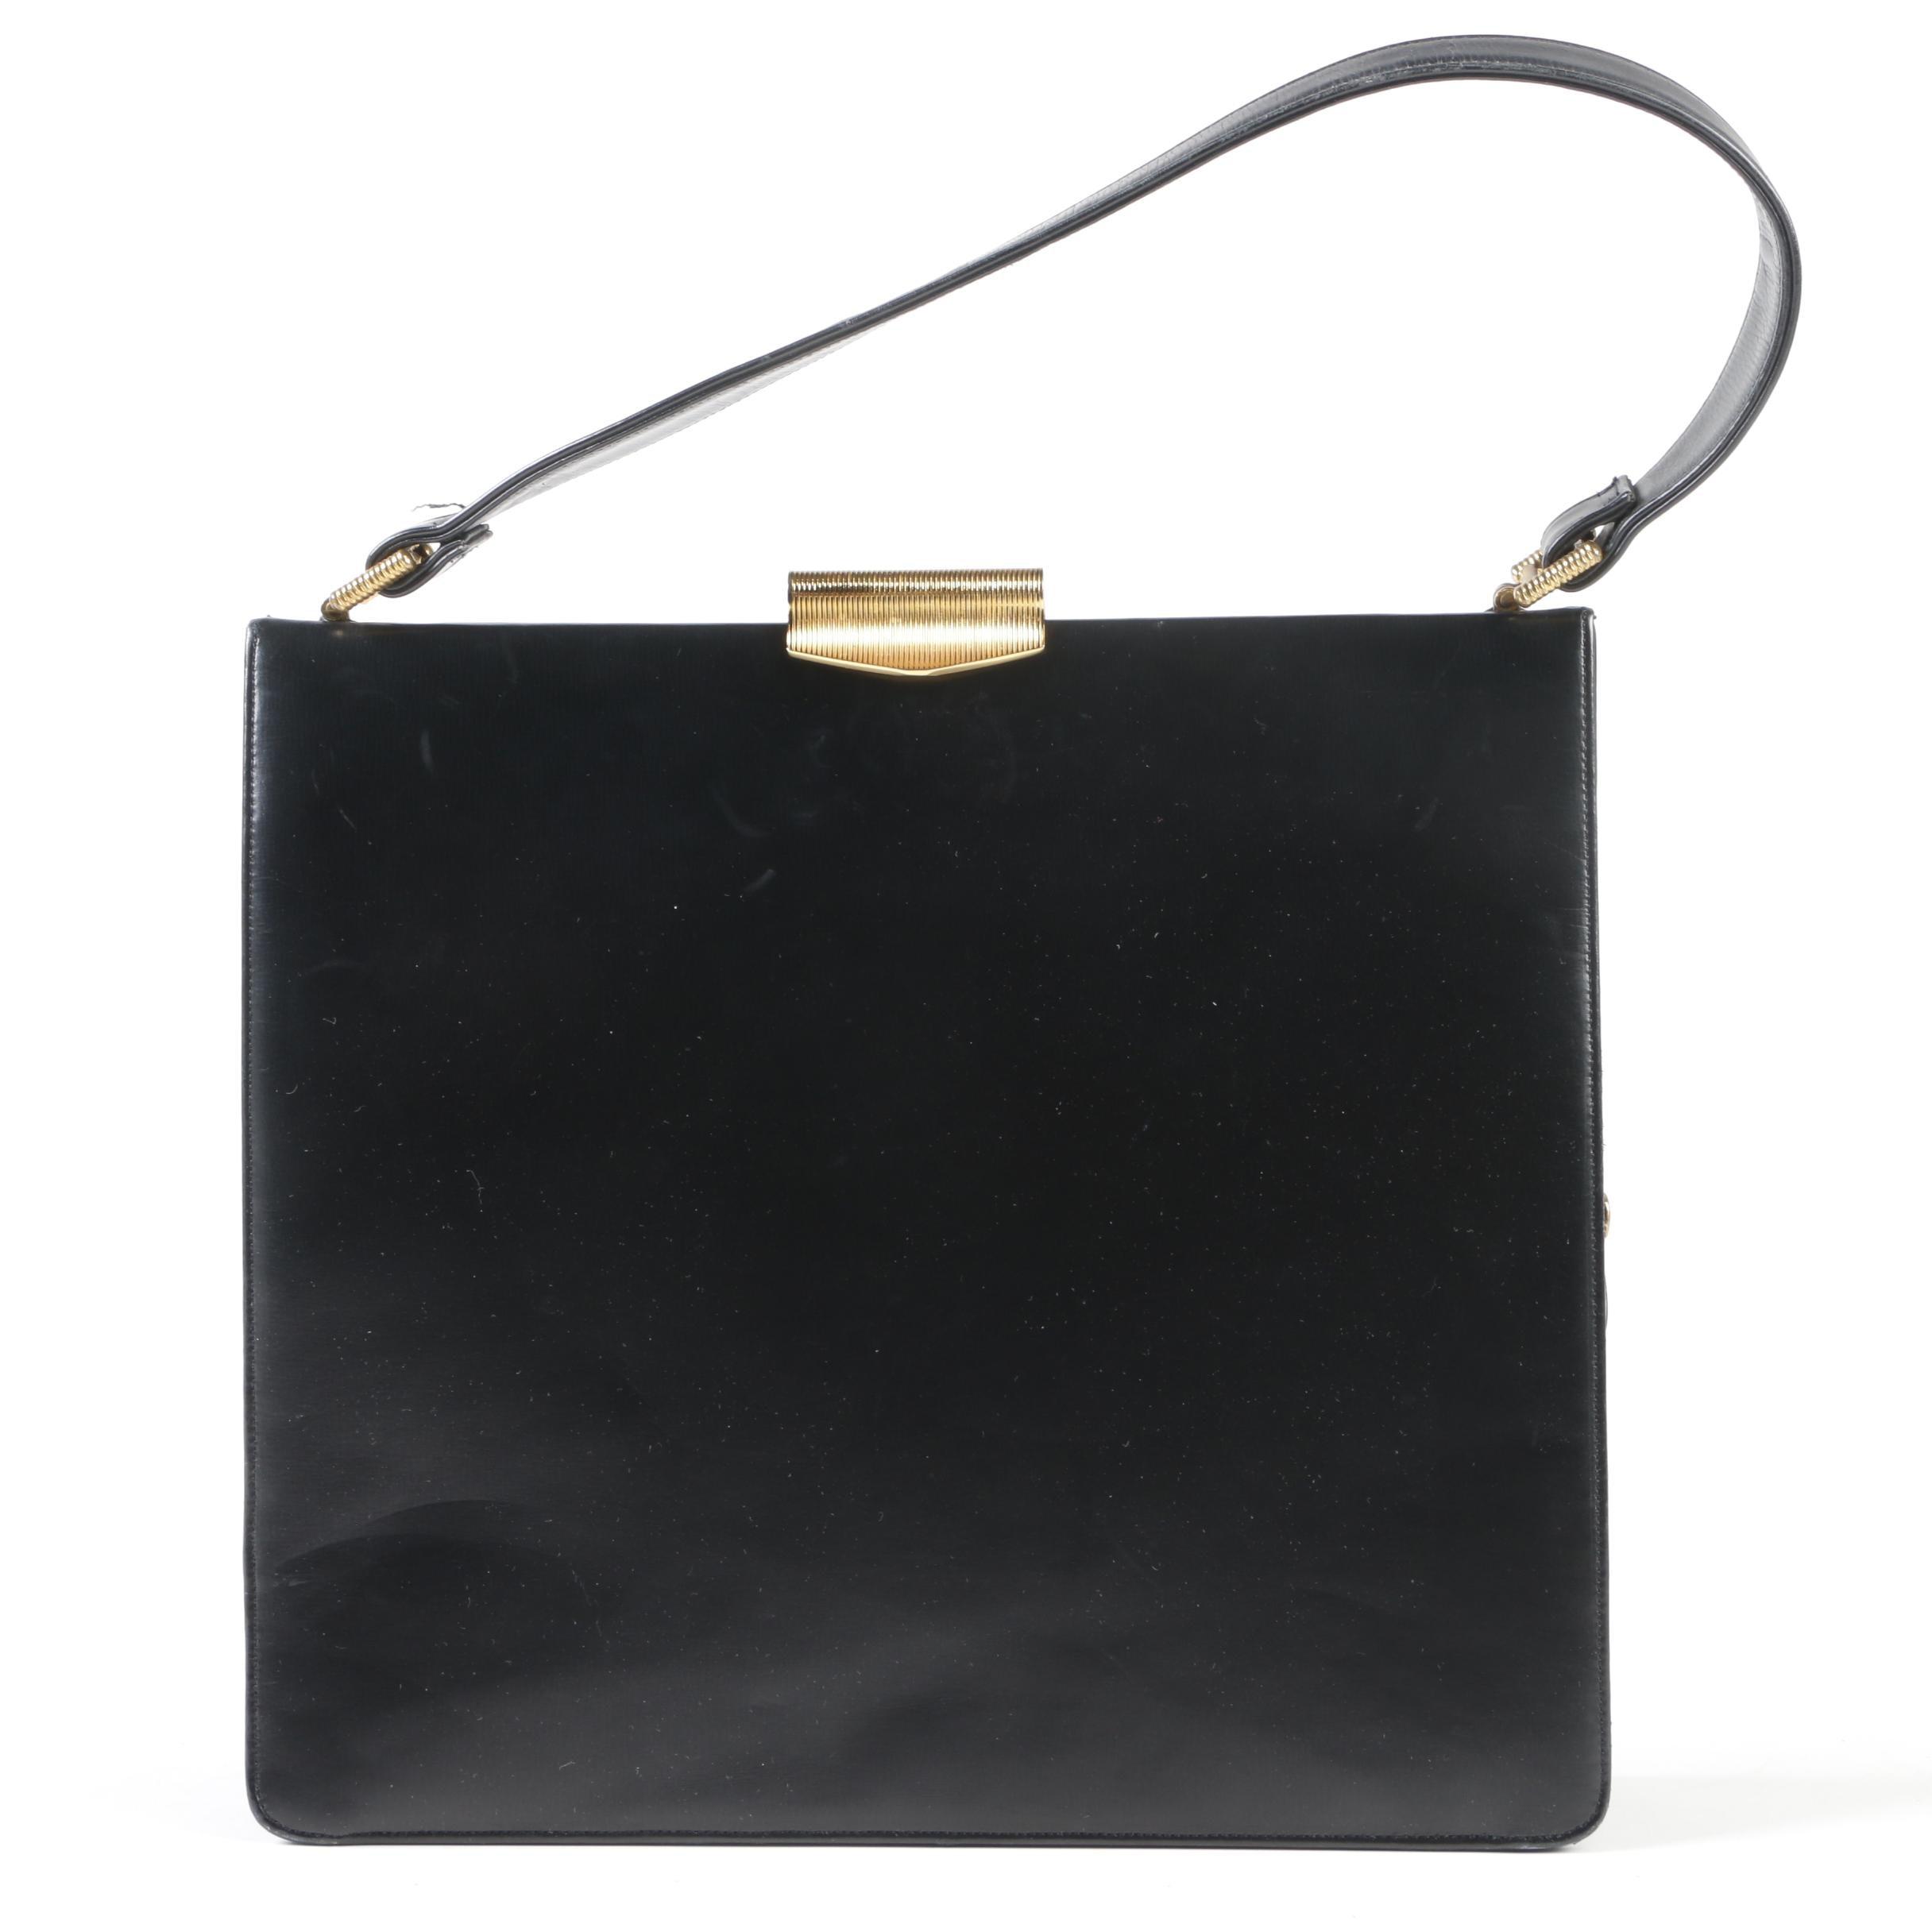 Koret Black Calfskin Leather Handbag with Ribbed Gold Tone Clasp, Circa 1960